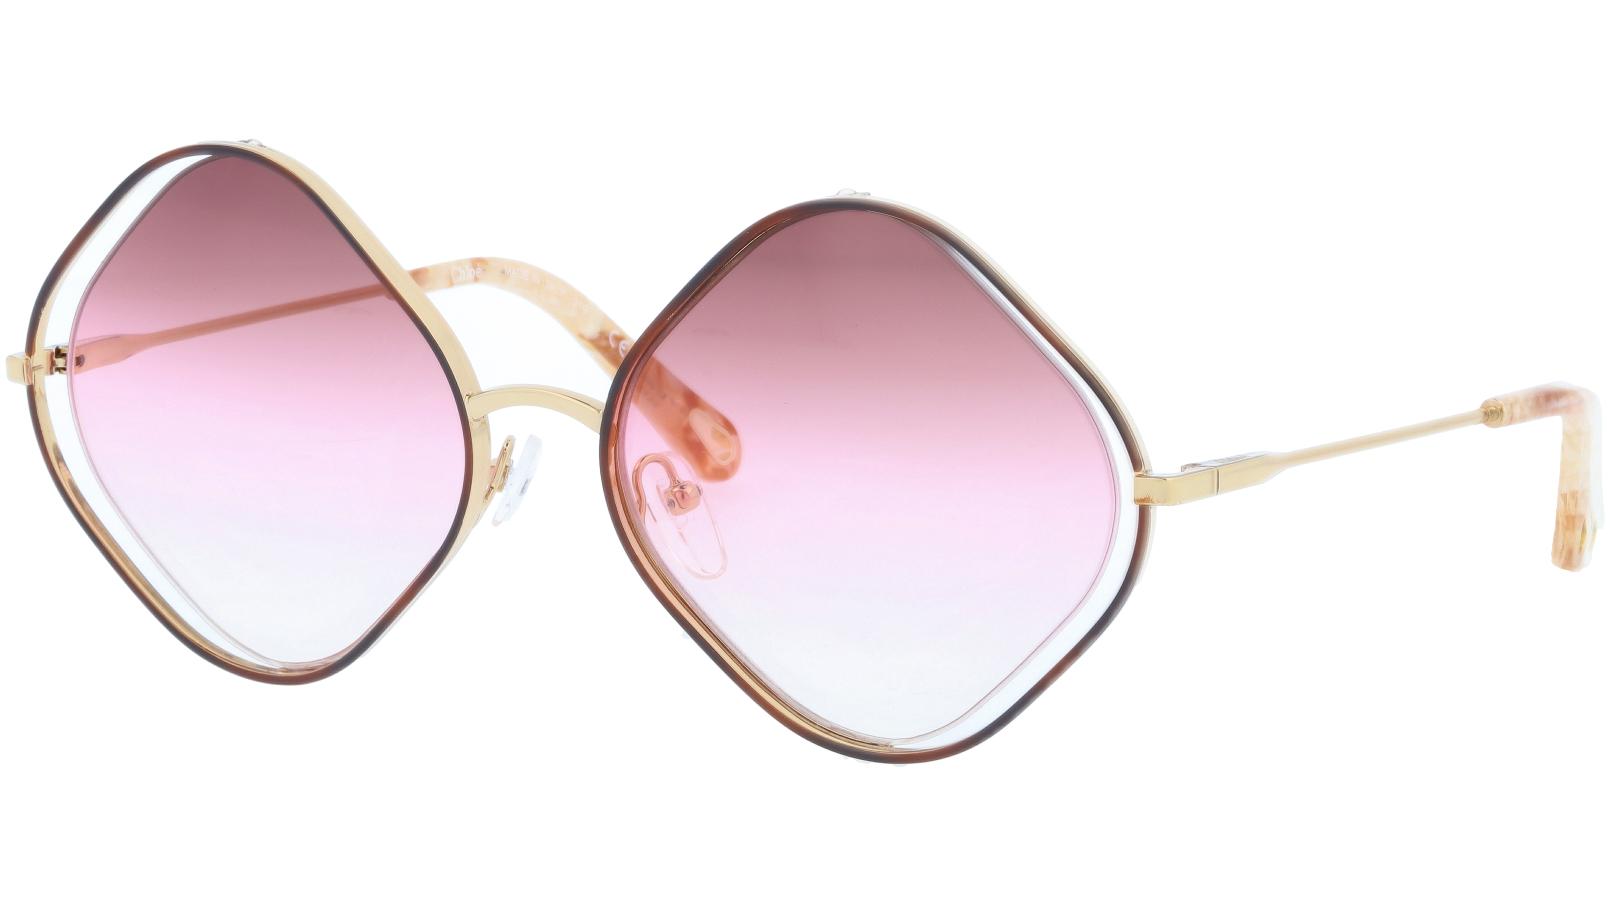 CHLOE CE159S 865 57 Havana Geometric Sunglasses